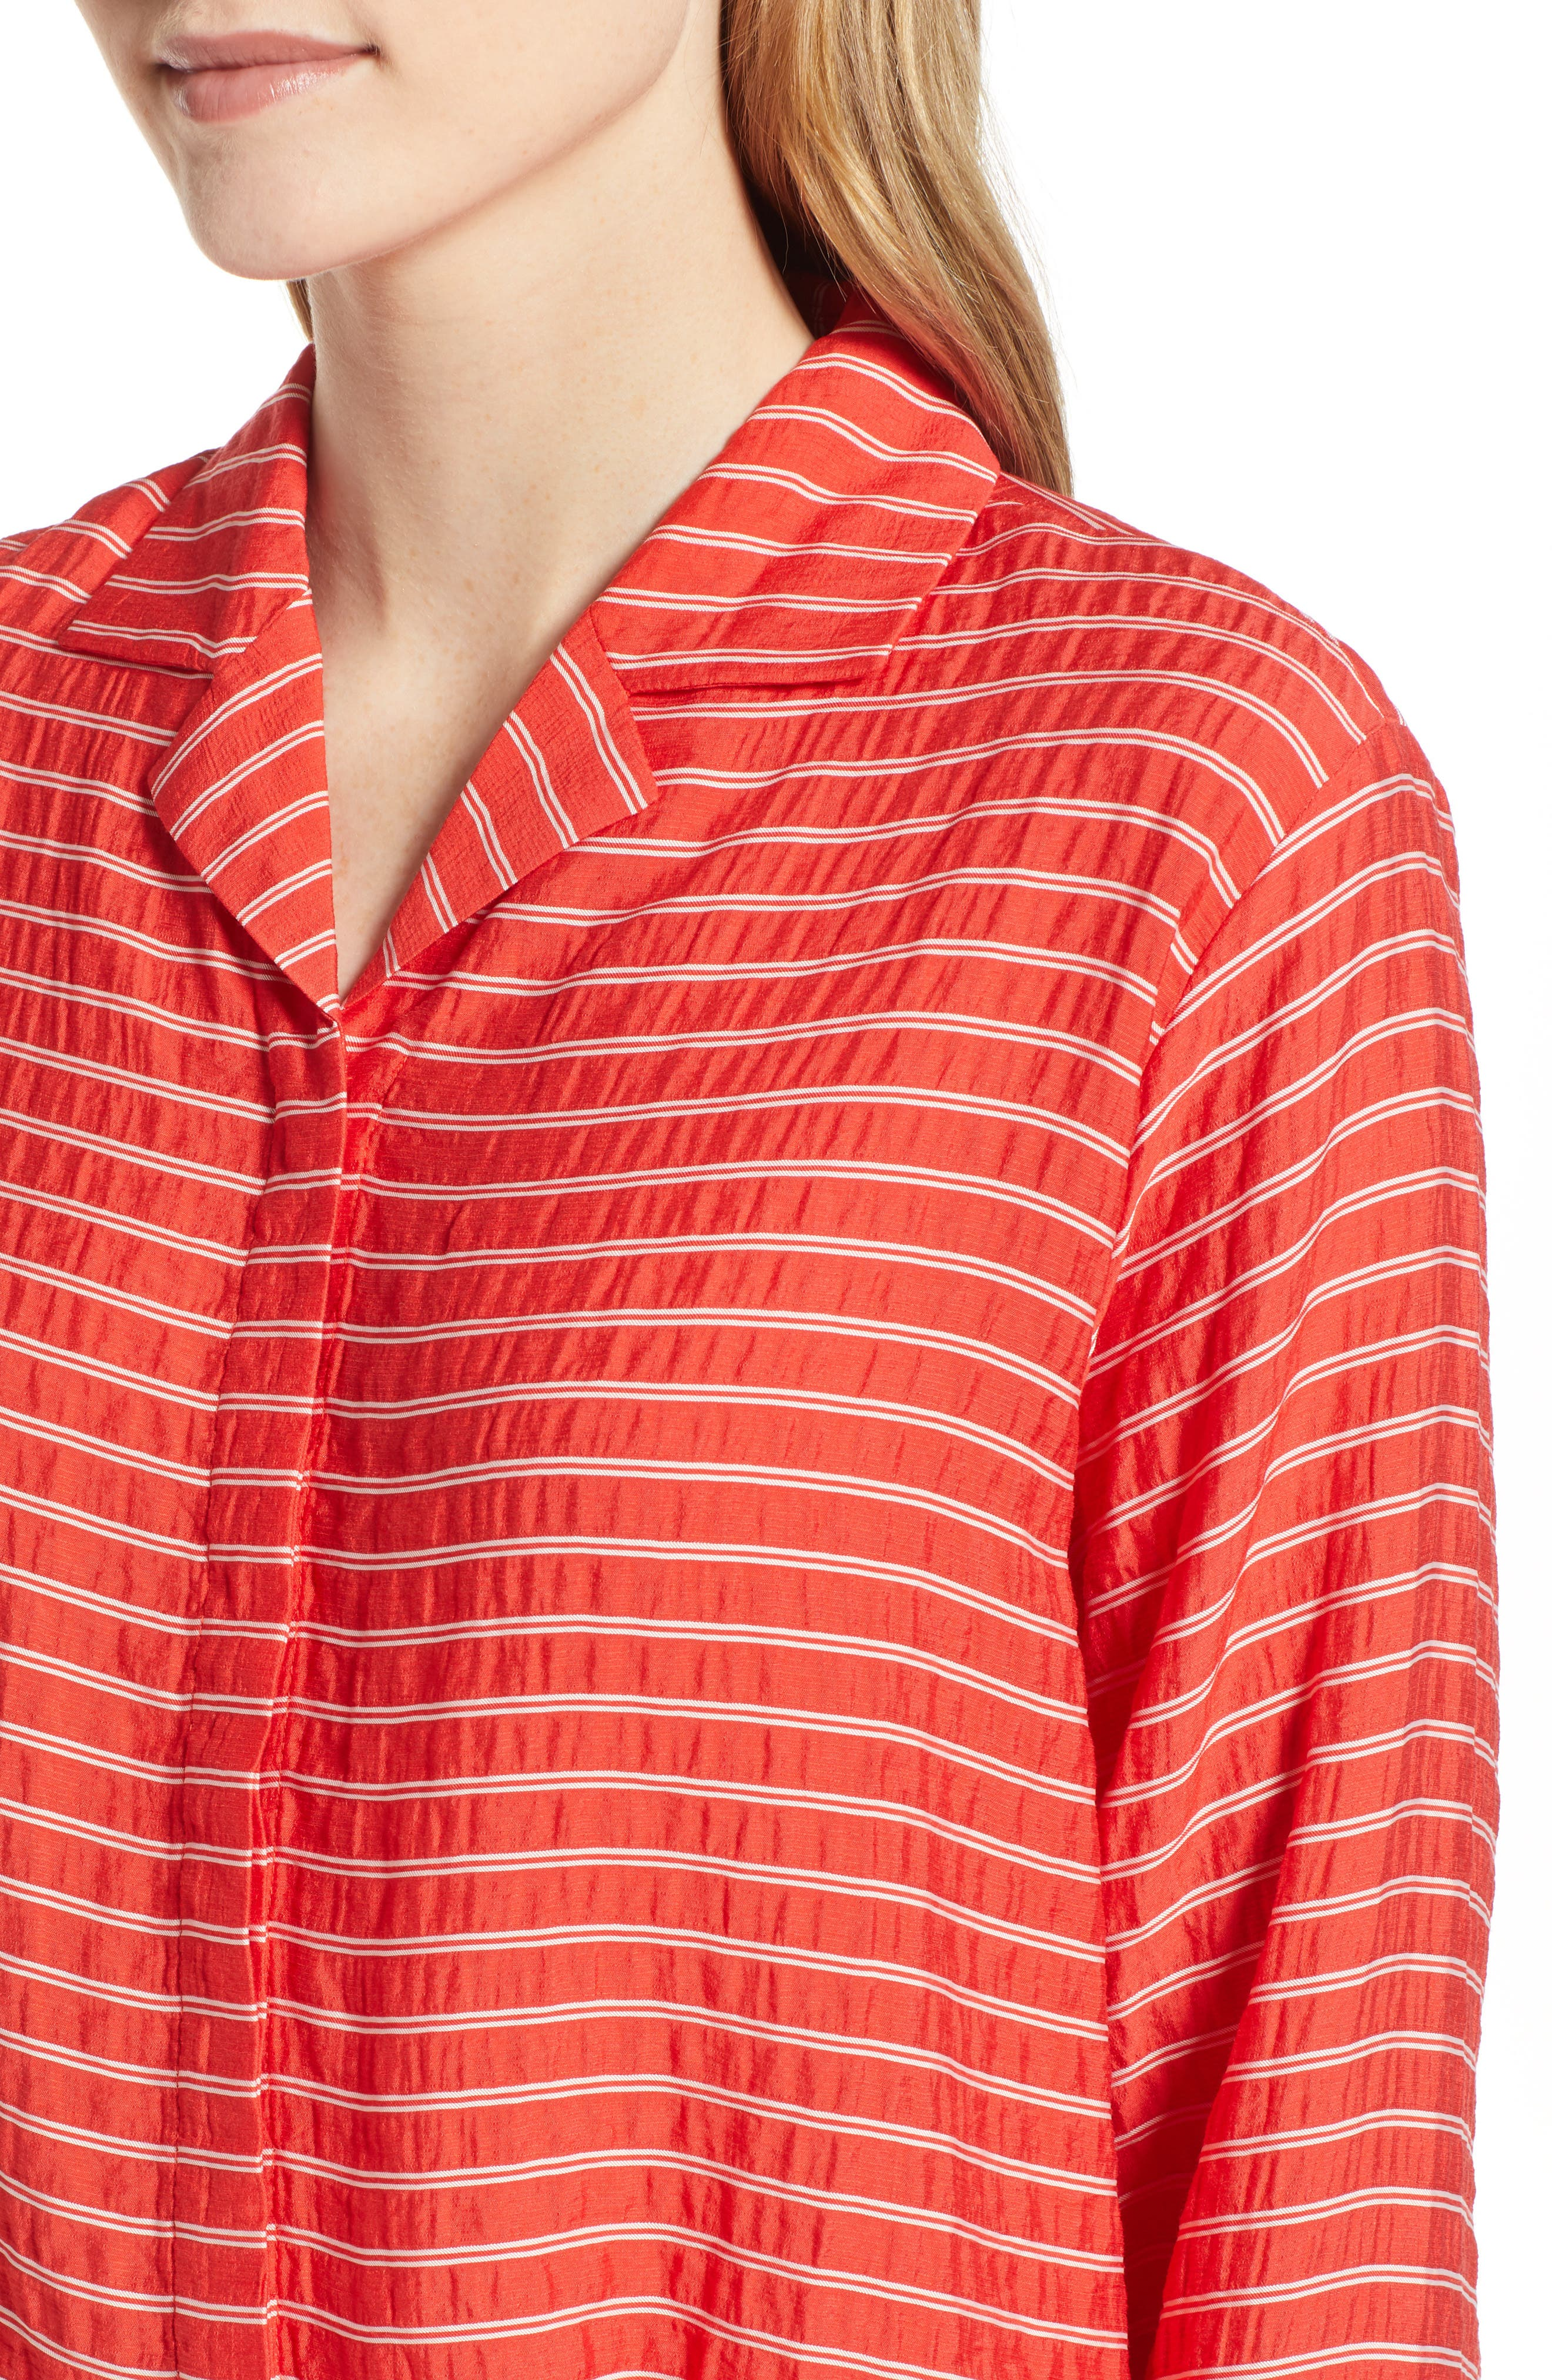 LOU & GREY, Sunny Stripe Drawstring Waist Blouse, Alternate thumbnail 4, color, 600